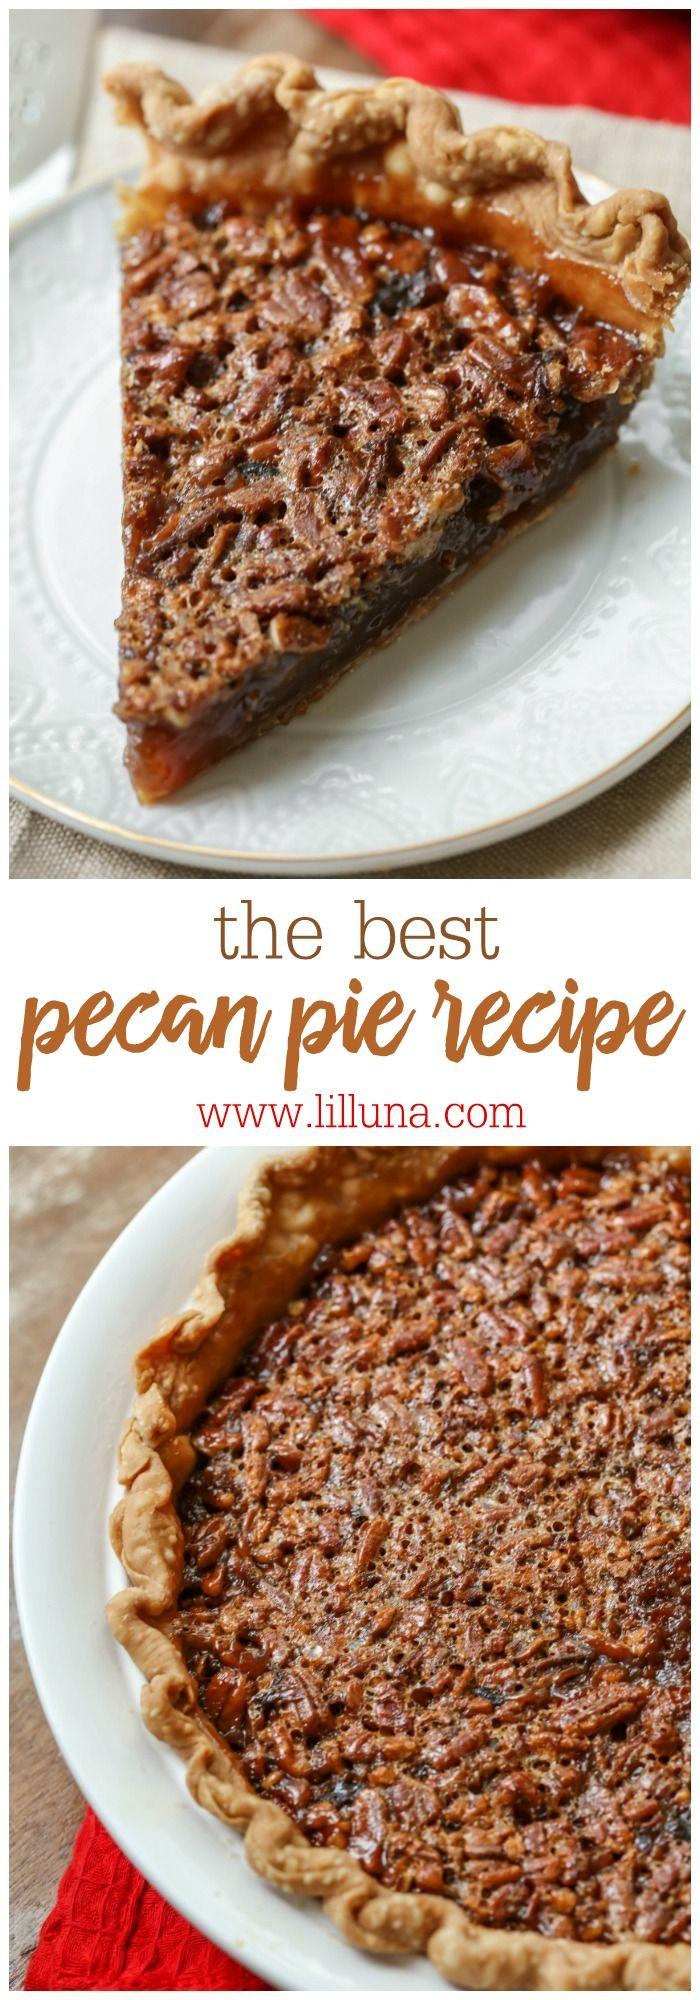 pecan pie recette i desserts cakes cheesecakes. Black Bedroom Furniture Sets. Home Design Ideas